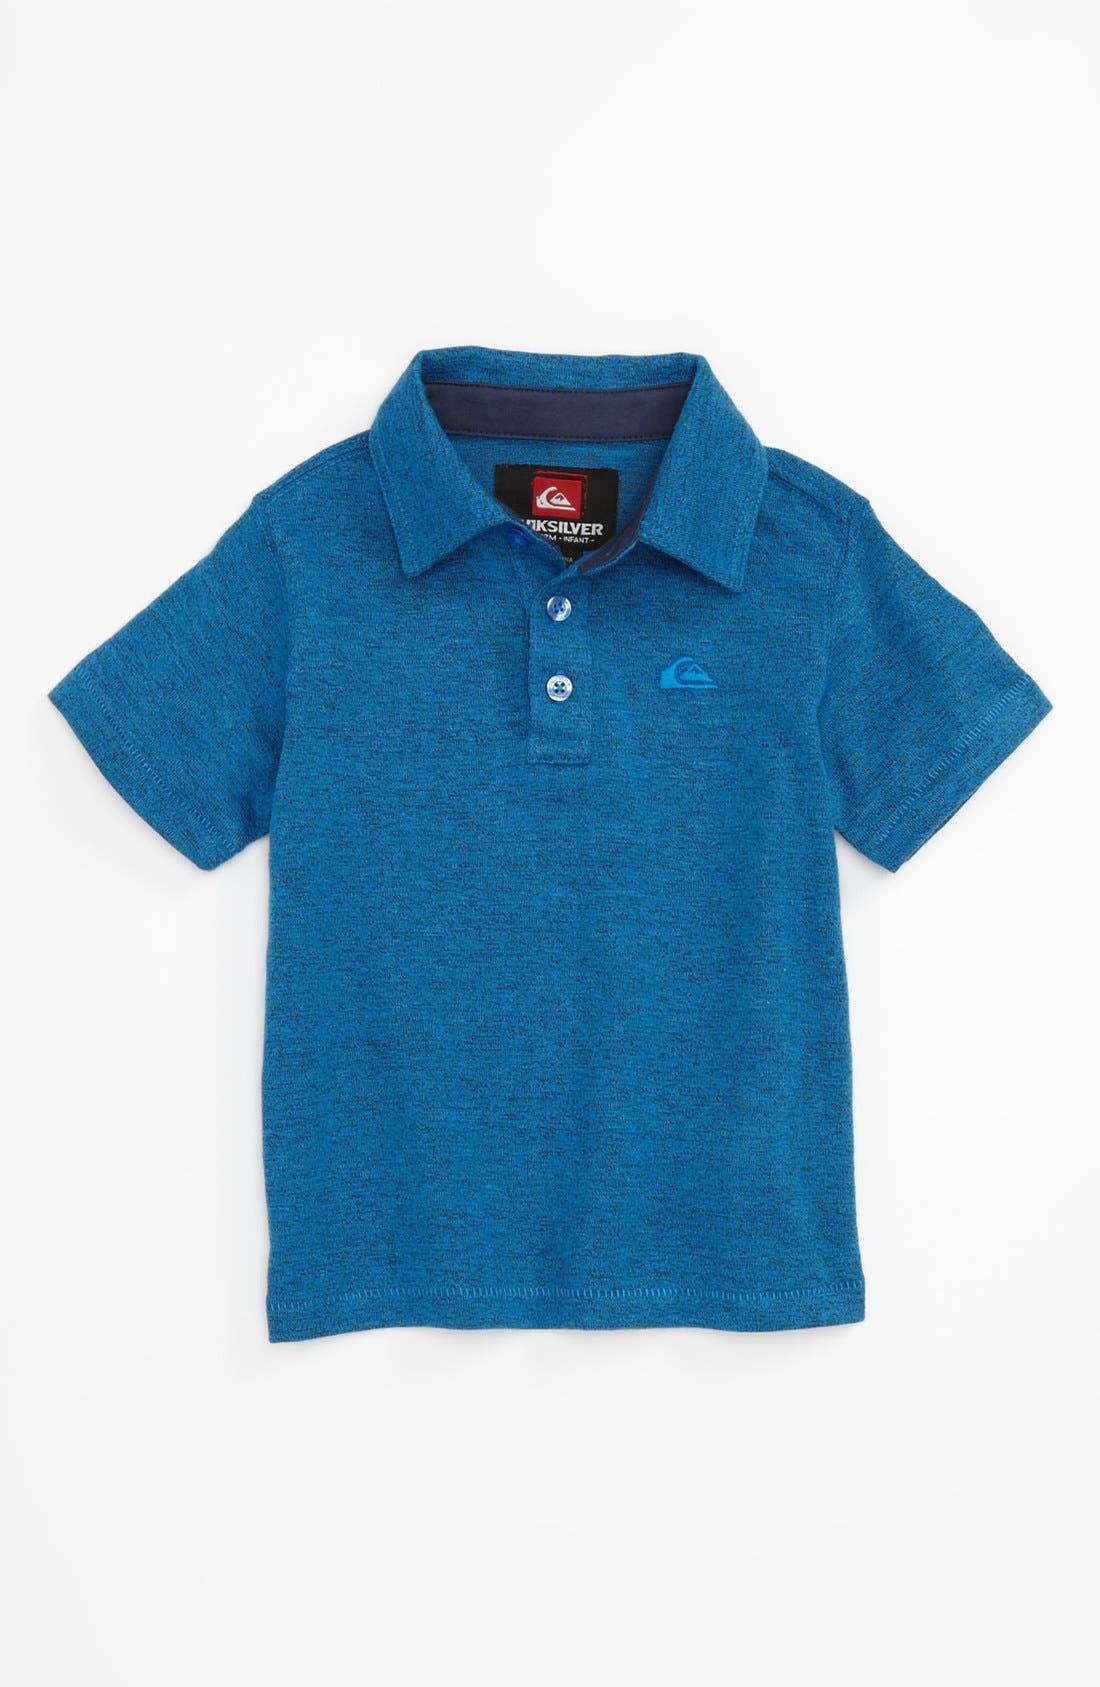 Alternate Image 1 Selected - Quiksilver 'Grab Bag' Polo Shirt (Toddler)